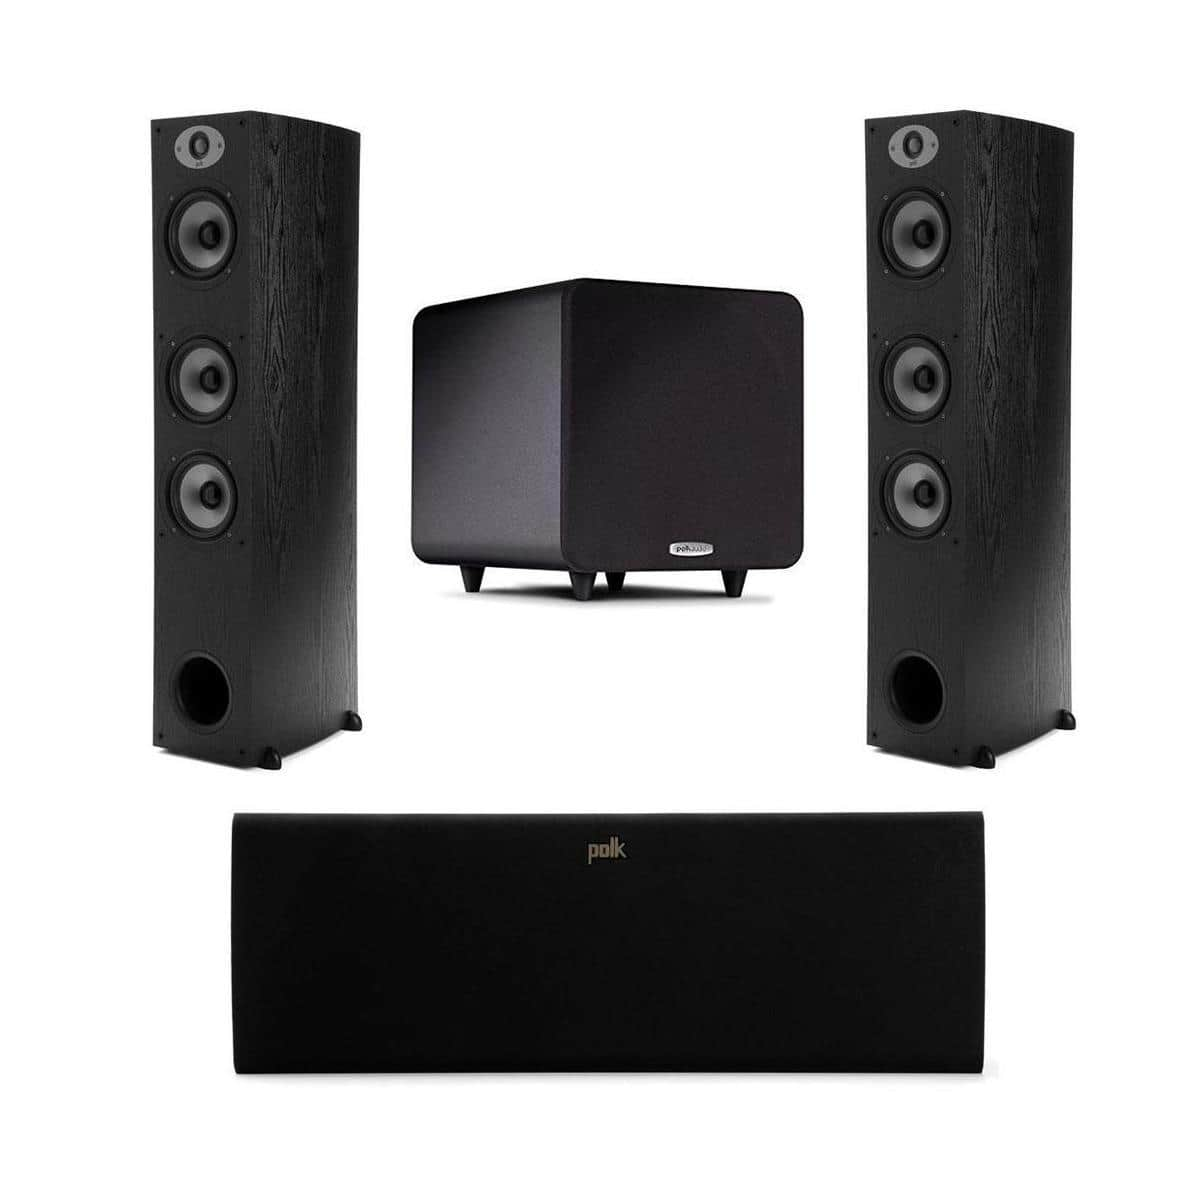 Polk Audio Speaker Bundle: (pair) TSx 440T Towers + TSx 250C Center + PSW111 Subwoofer $650 + free shipping